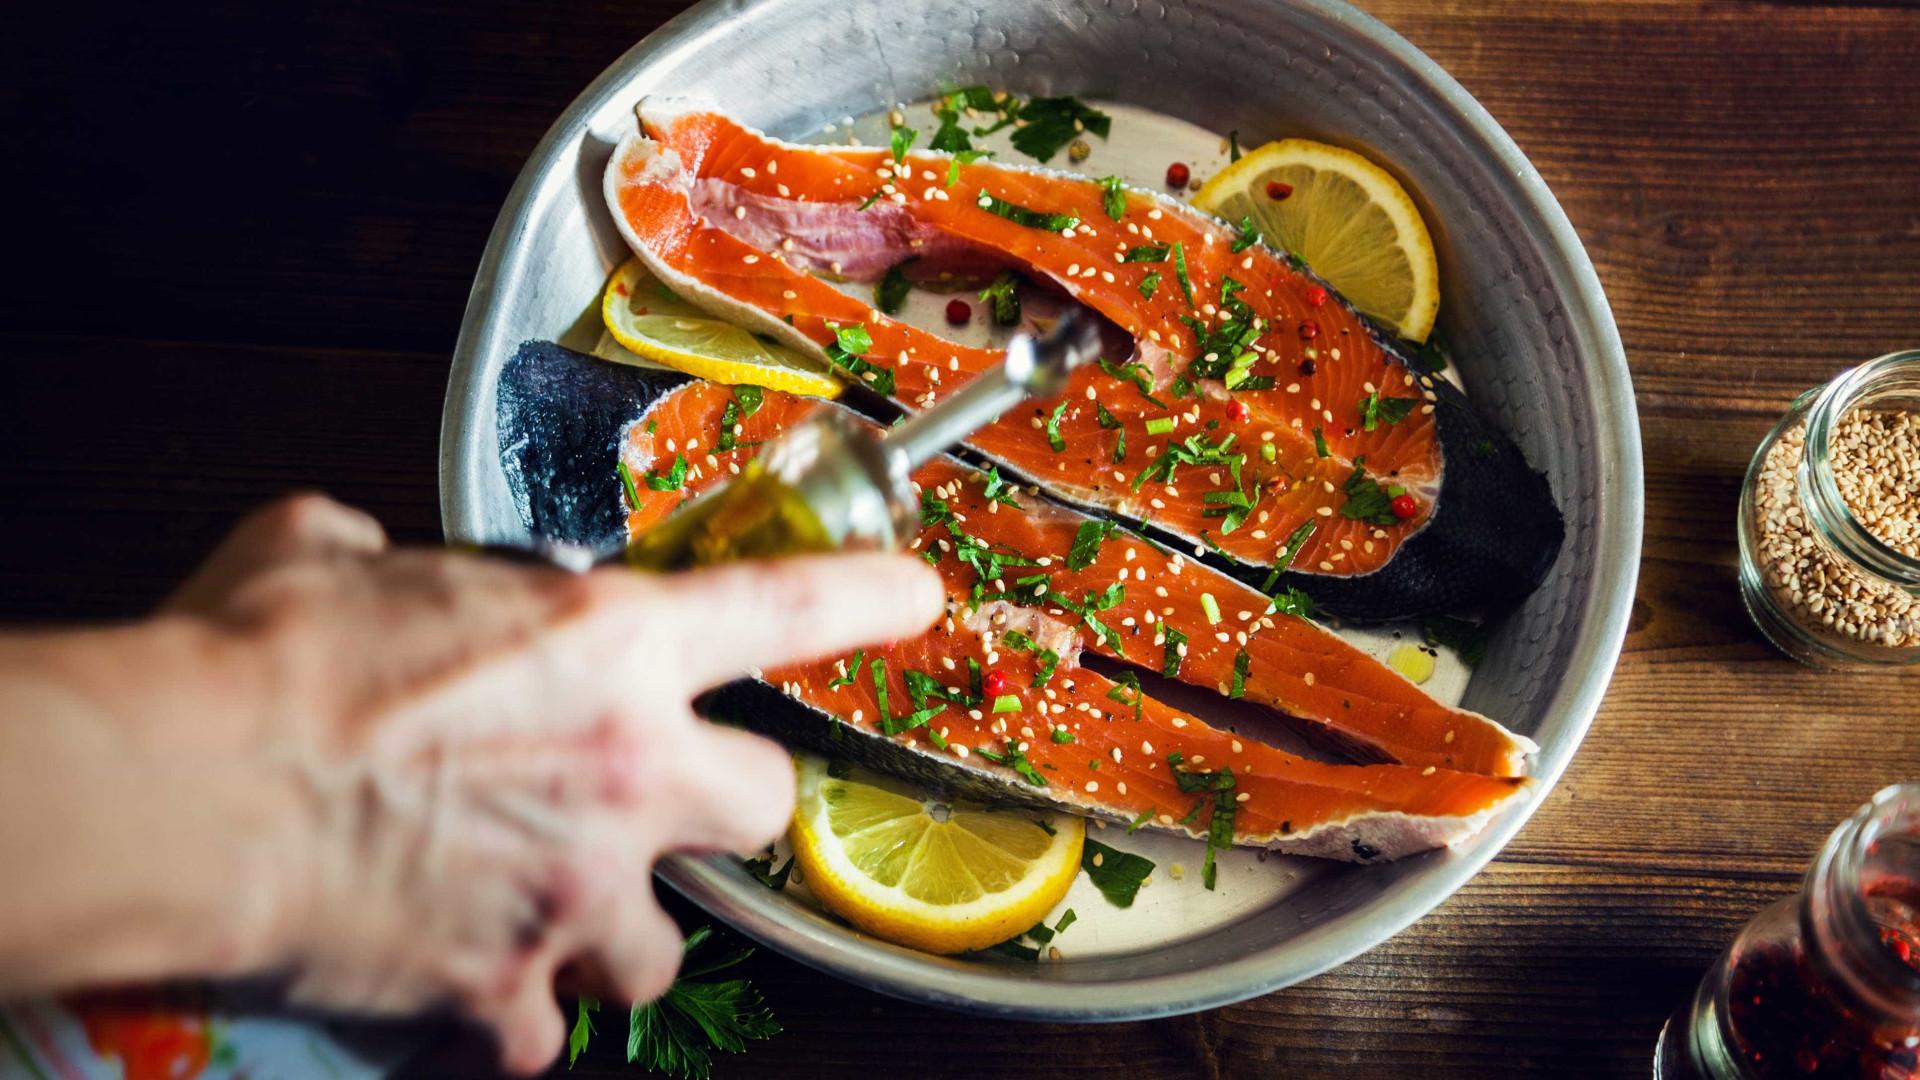 Vinte bons motivos para comer mais peixe